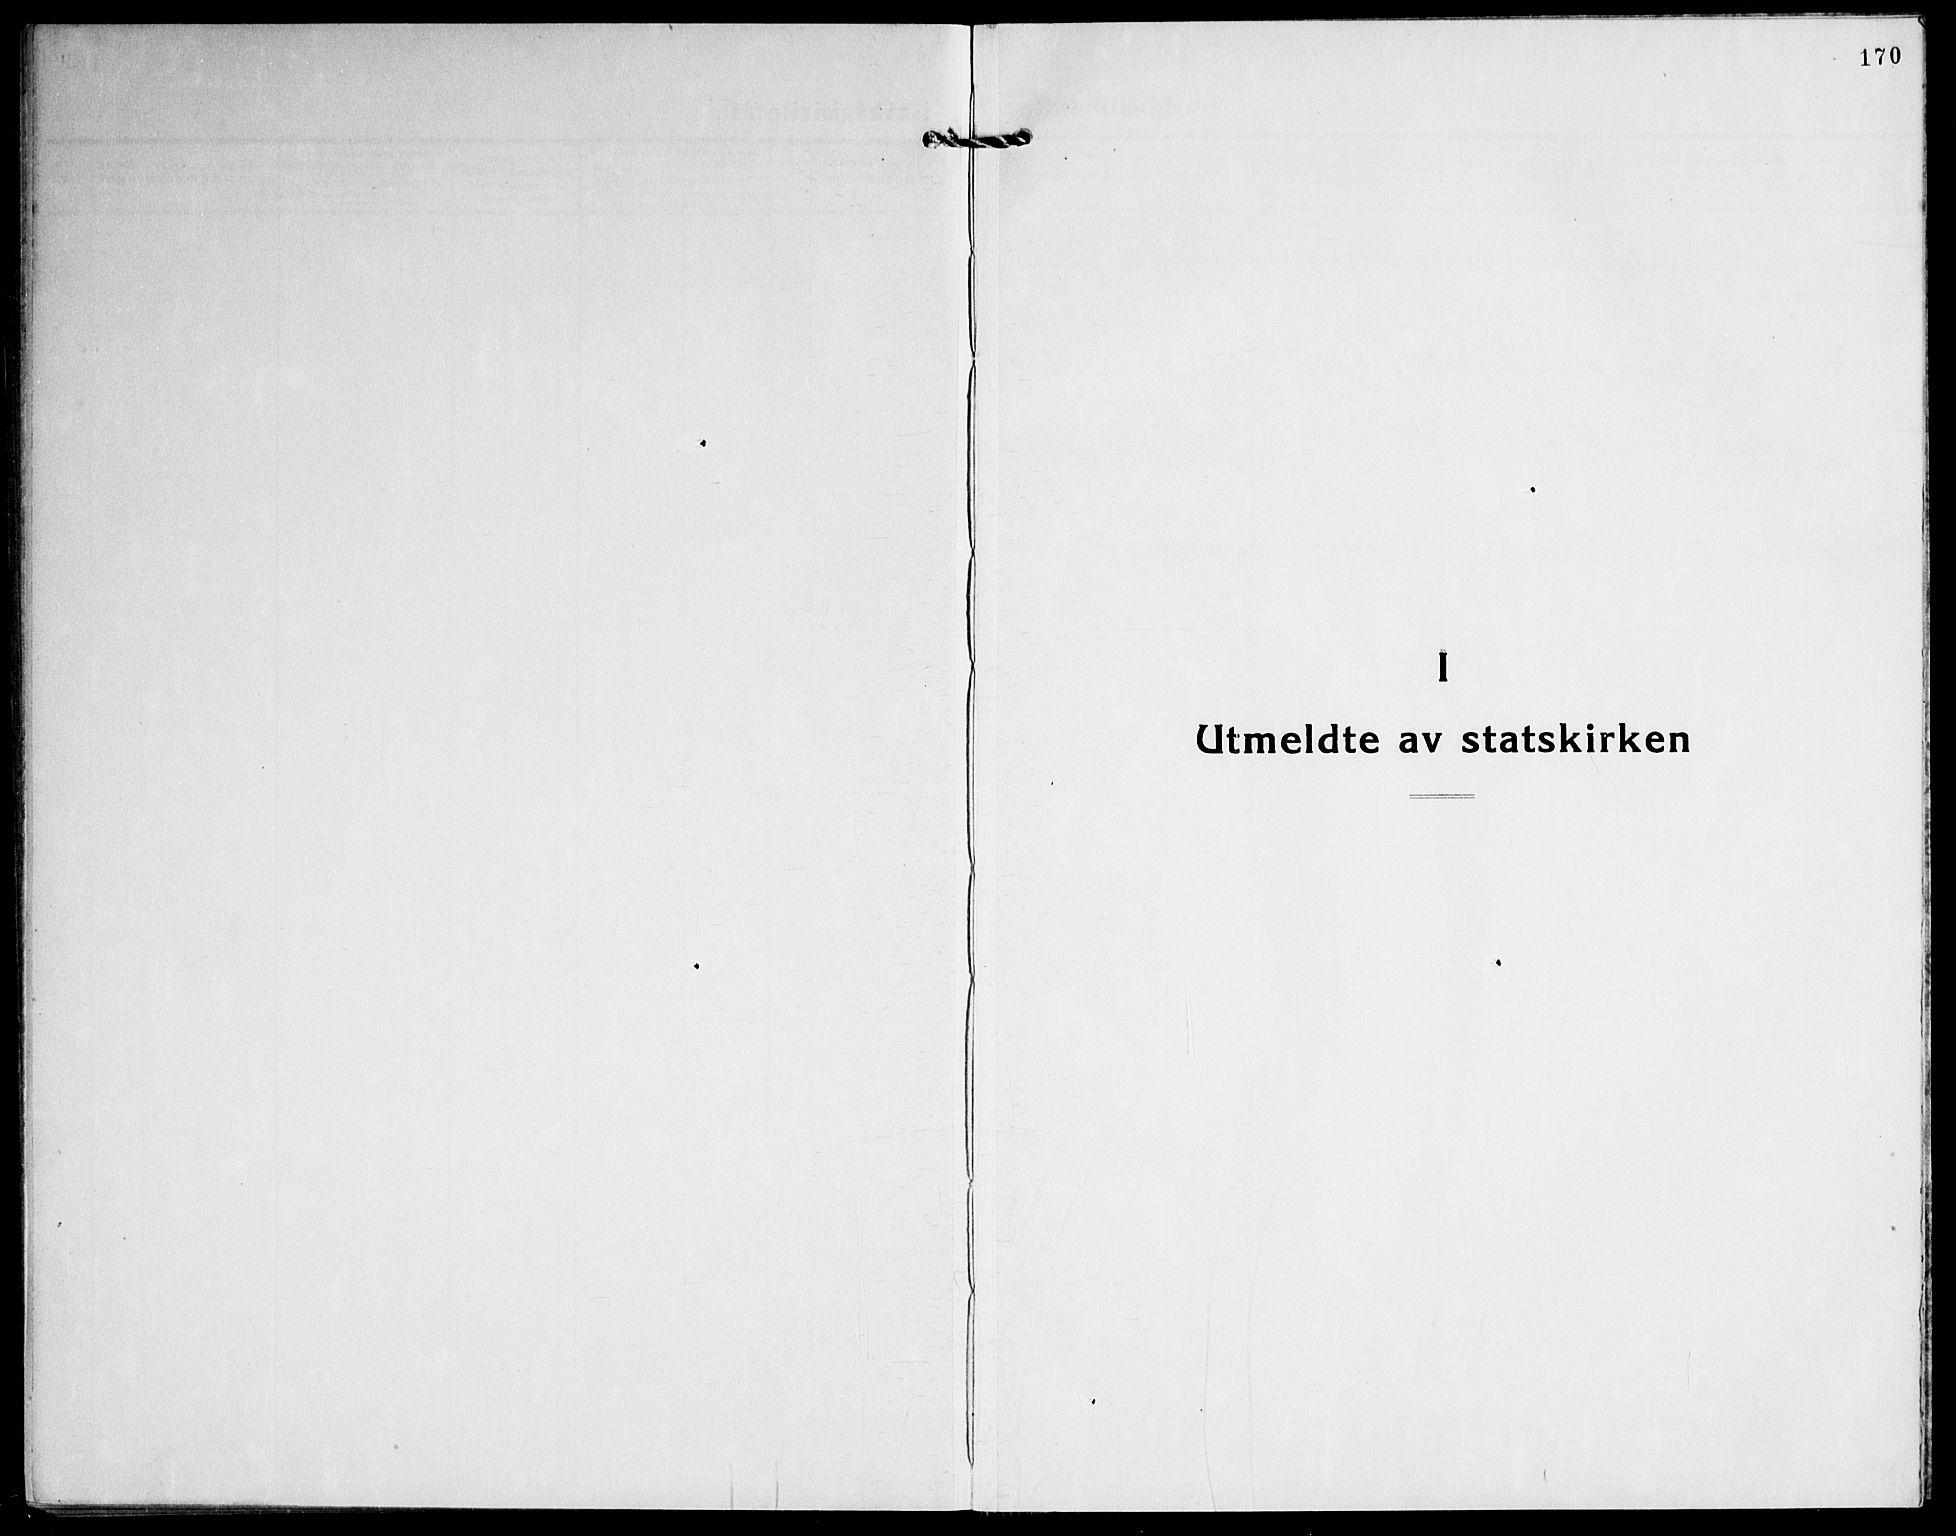 SATØ, Tranøy sokneprestkontor, I/Ia/Iab/L0016klokker: Klokkerbok nr. 16, 1930-1945, s. 170